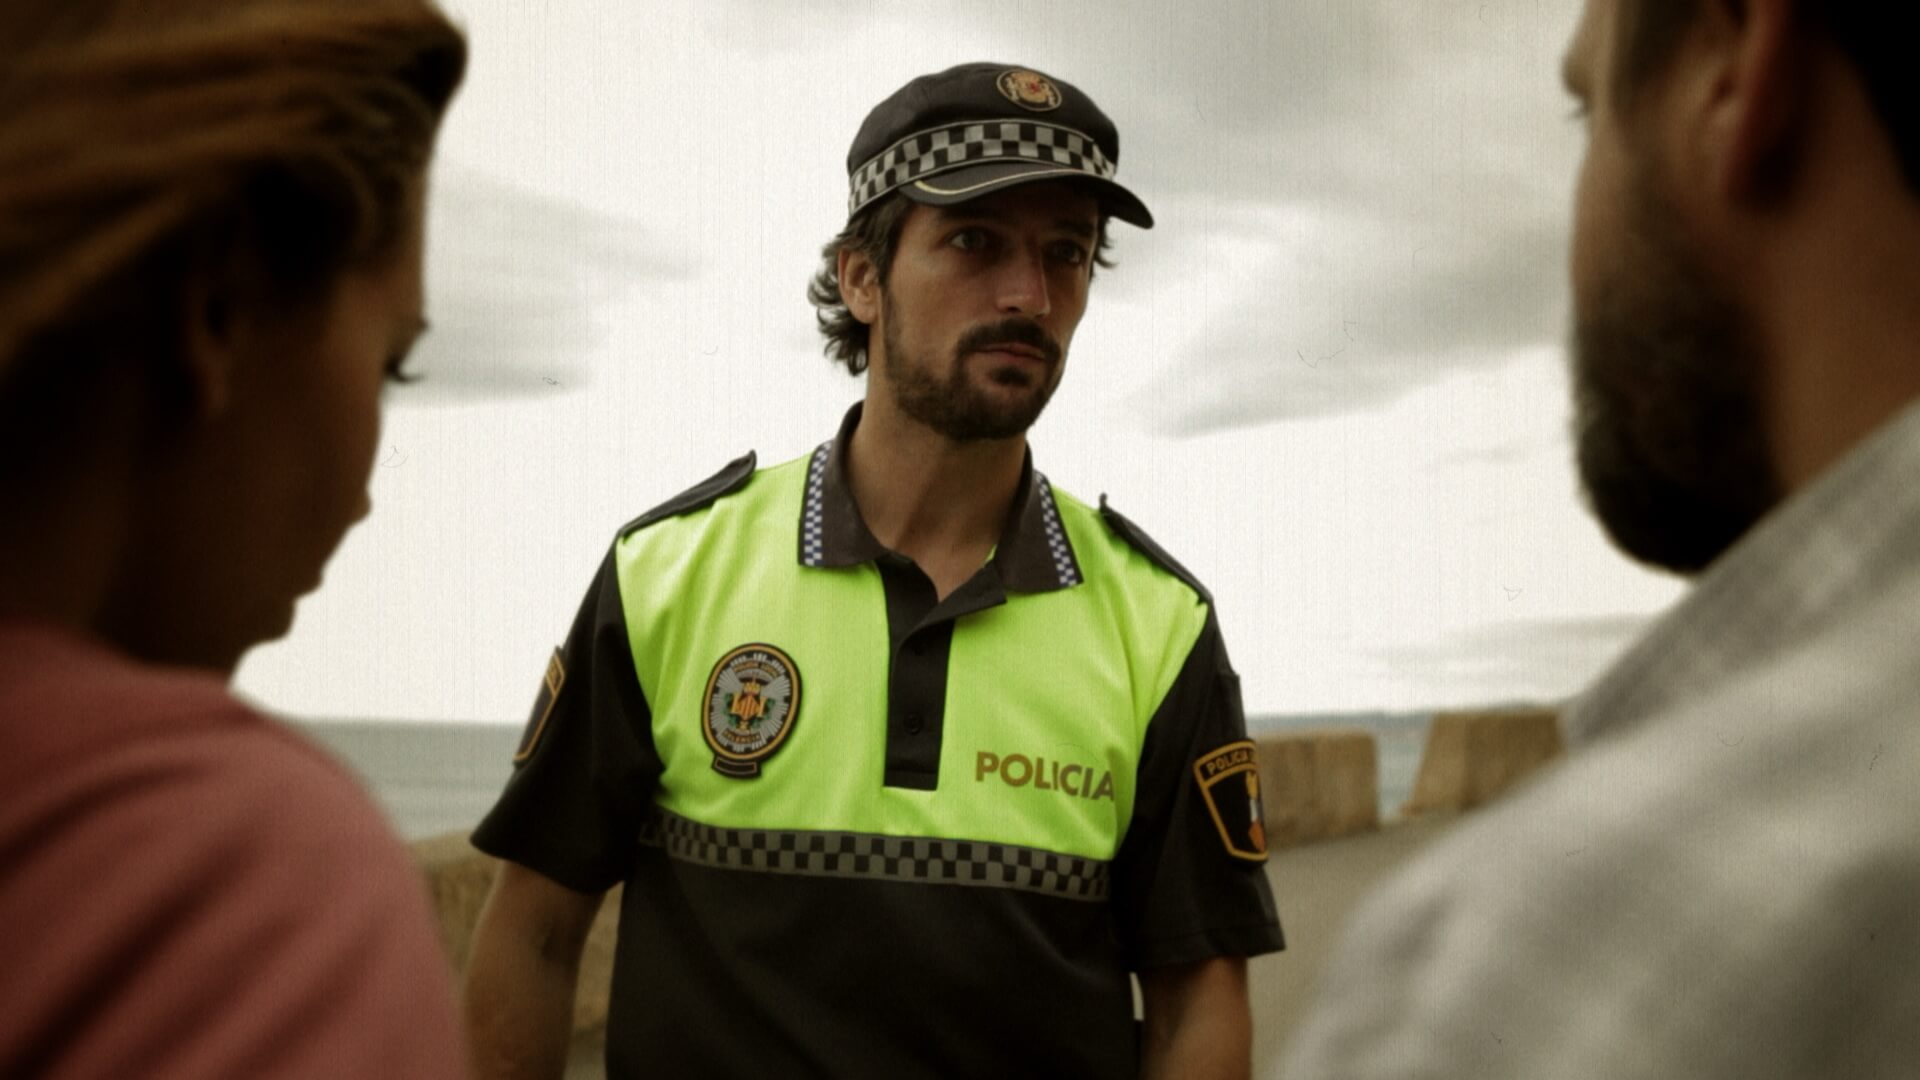 La Cruz Policeman Pablo Castañón